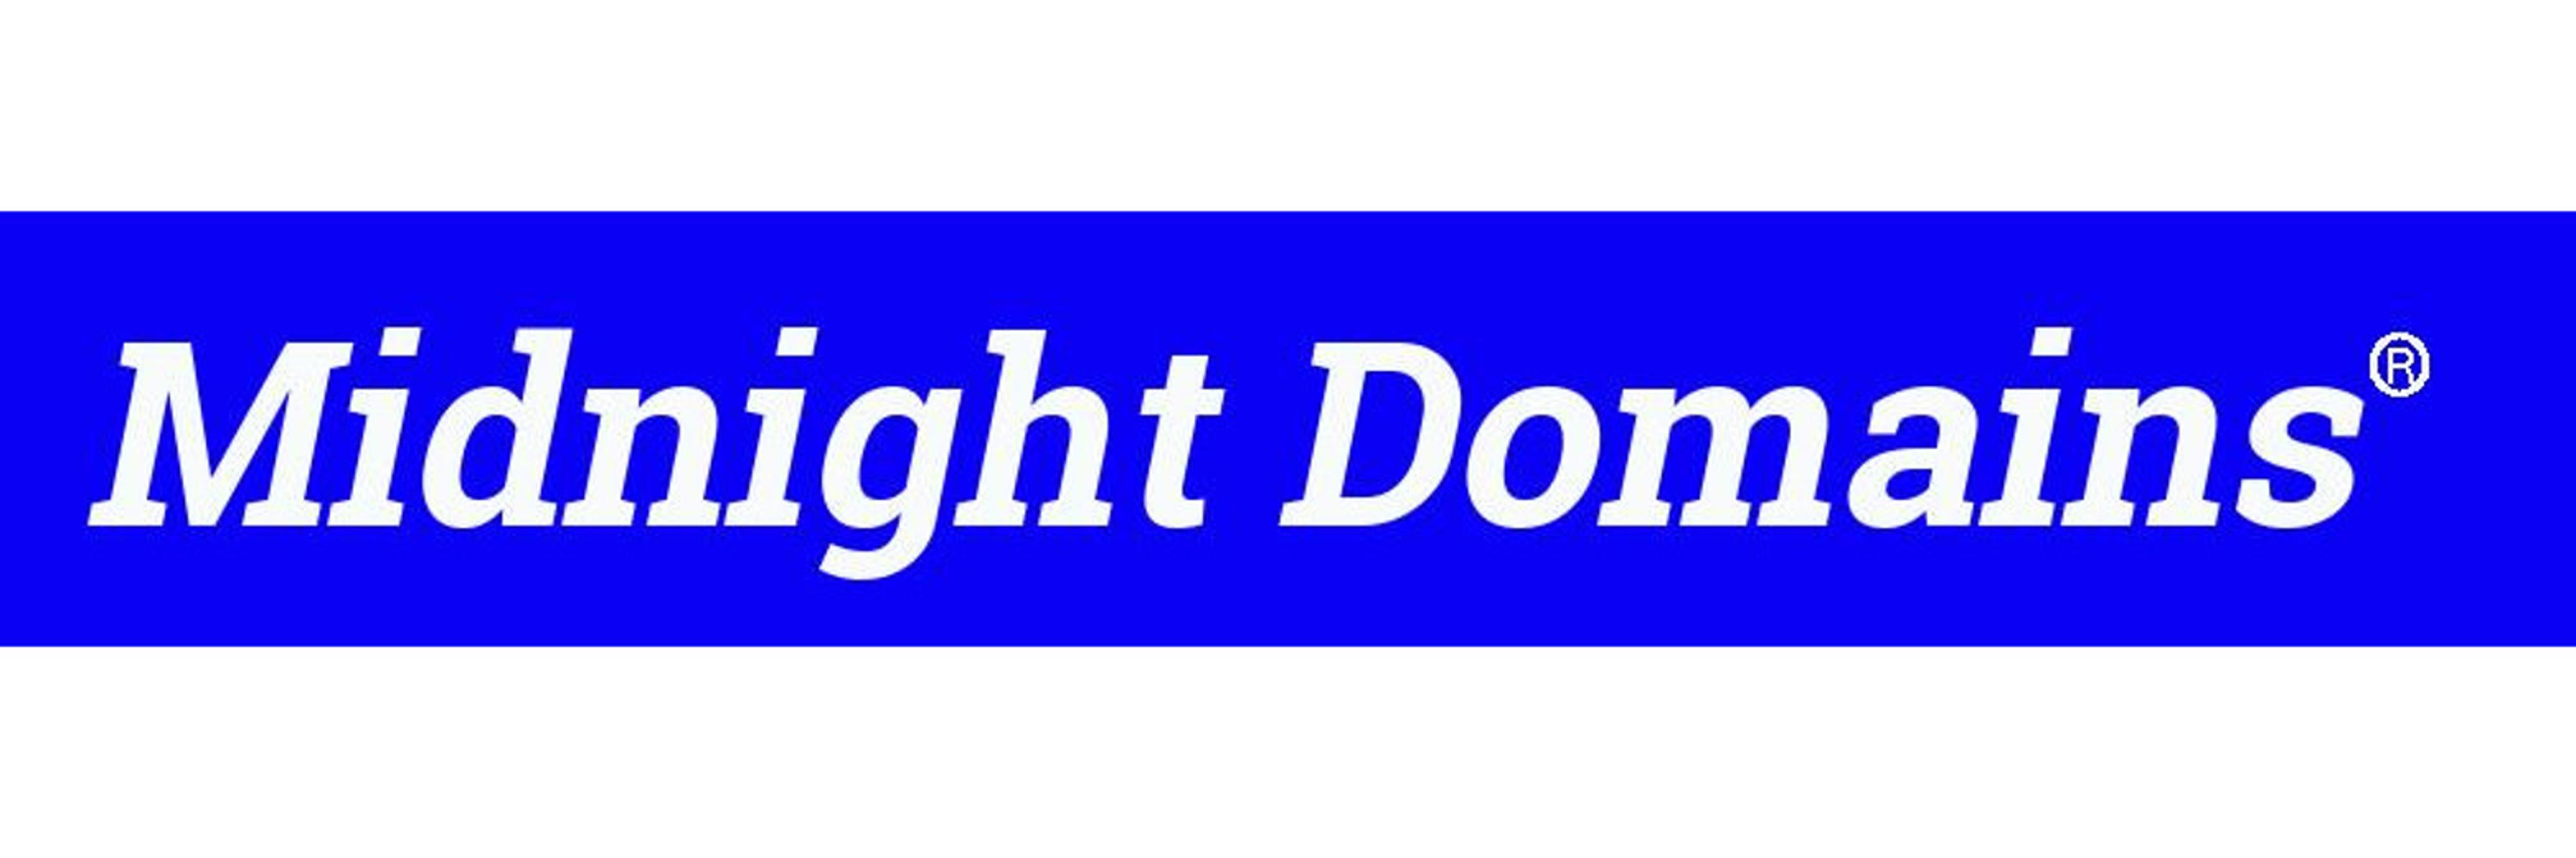 midnightdomains.com